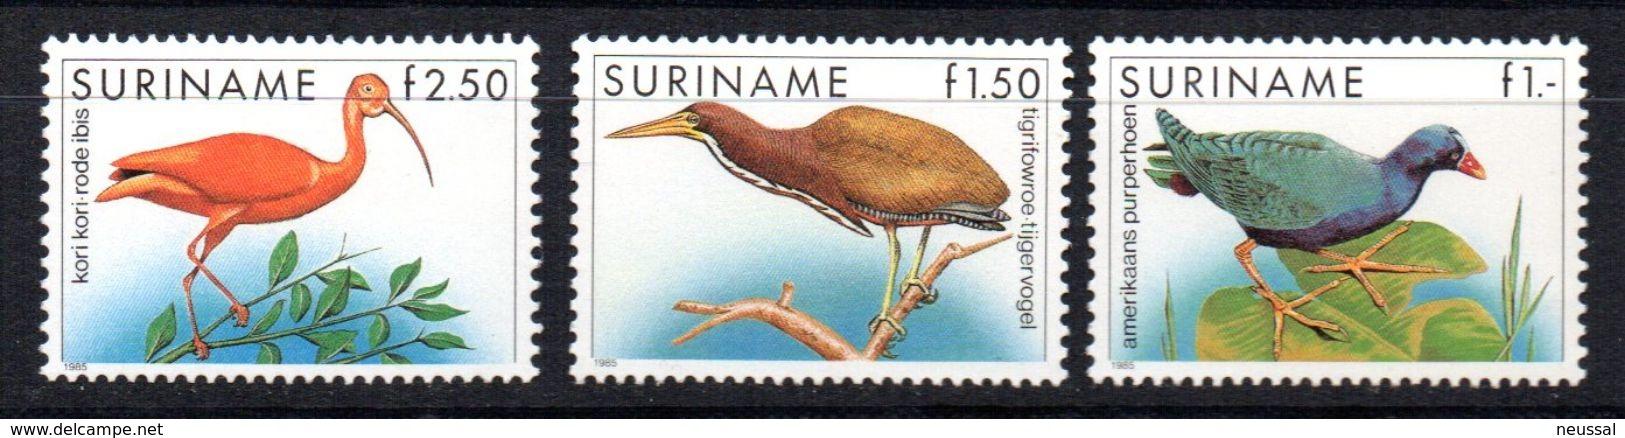 Serie Nº 1014/6 Suriname - Birds